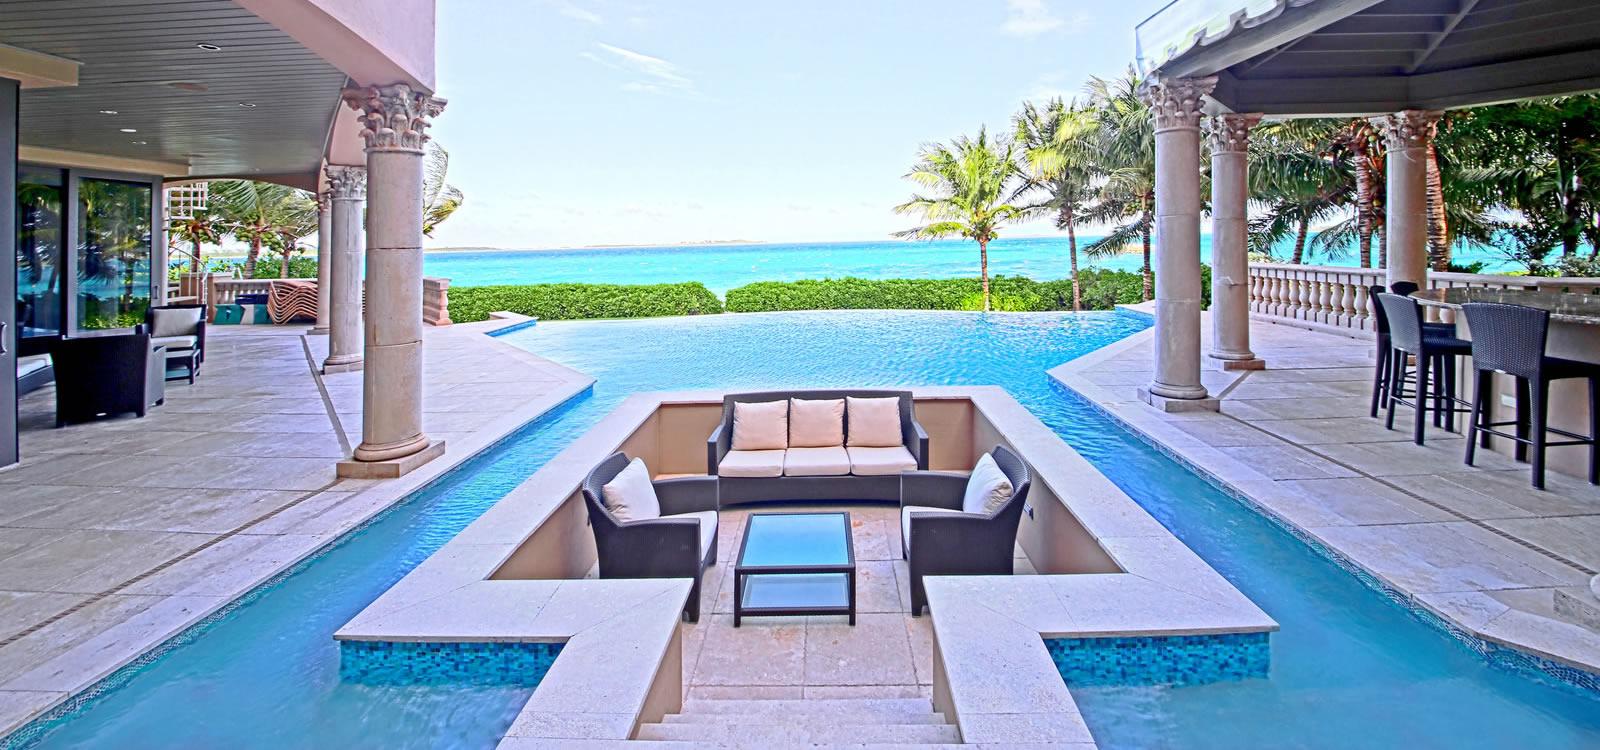 Luxury Beachfront Home For Sale Paradise Island Bahamas 2